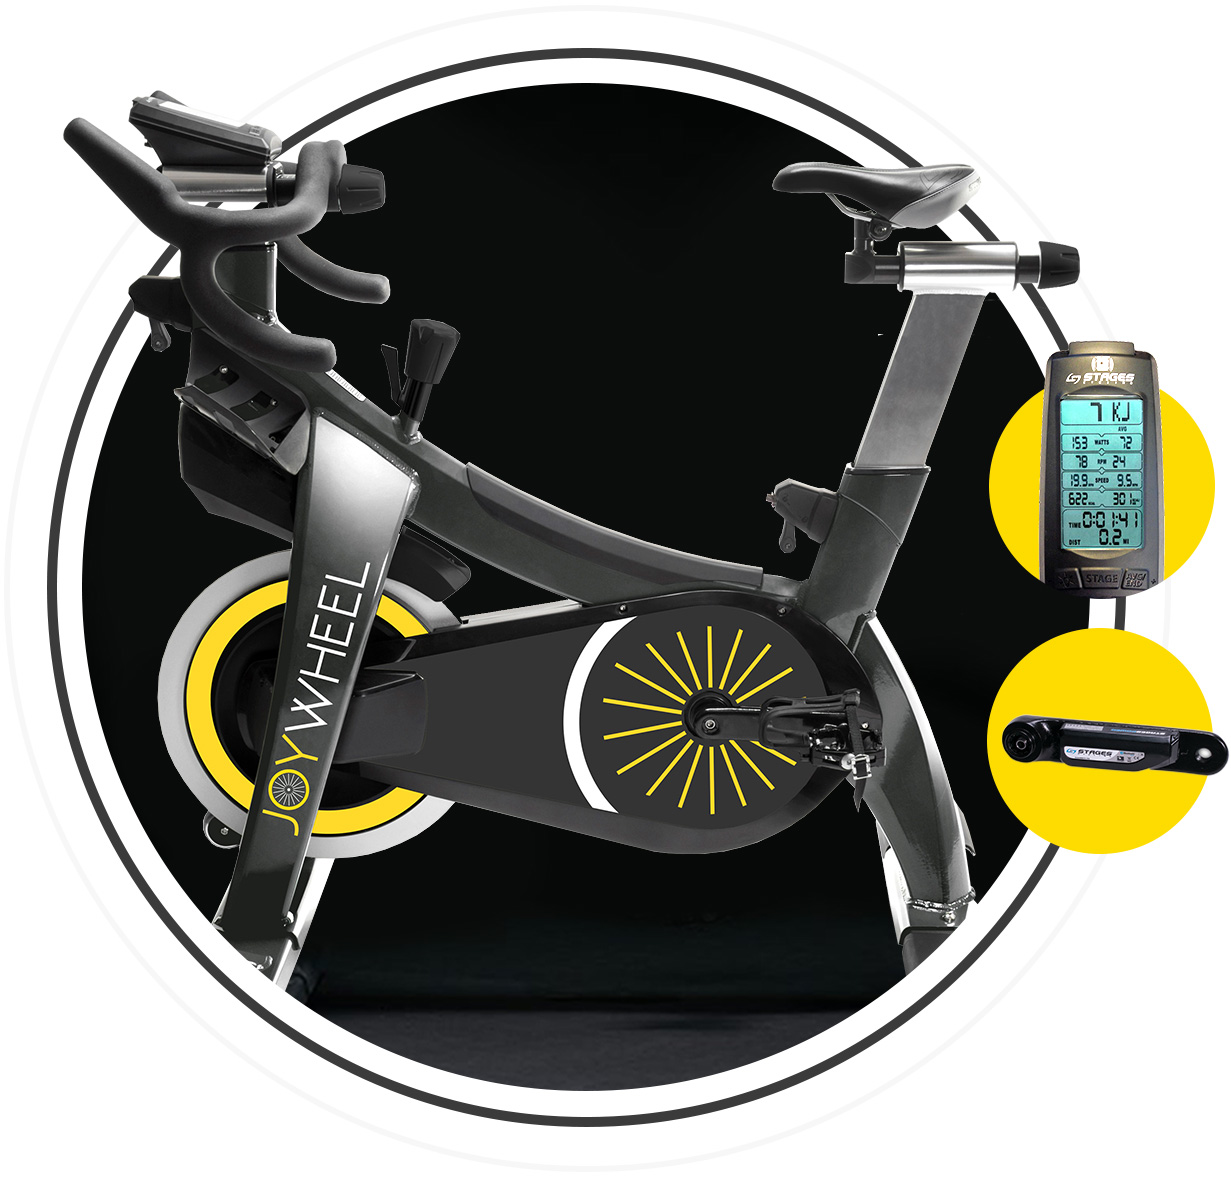 joywheel_tech_bikes.jpg